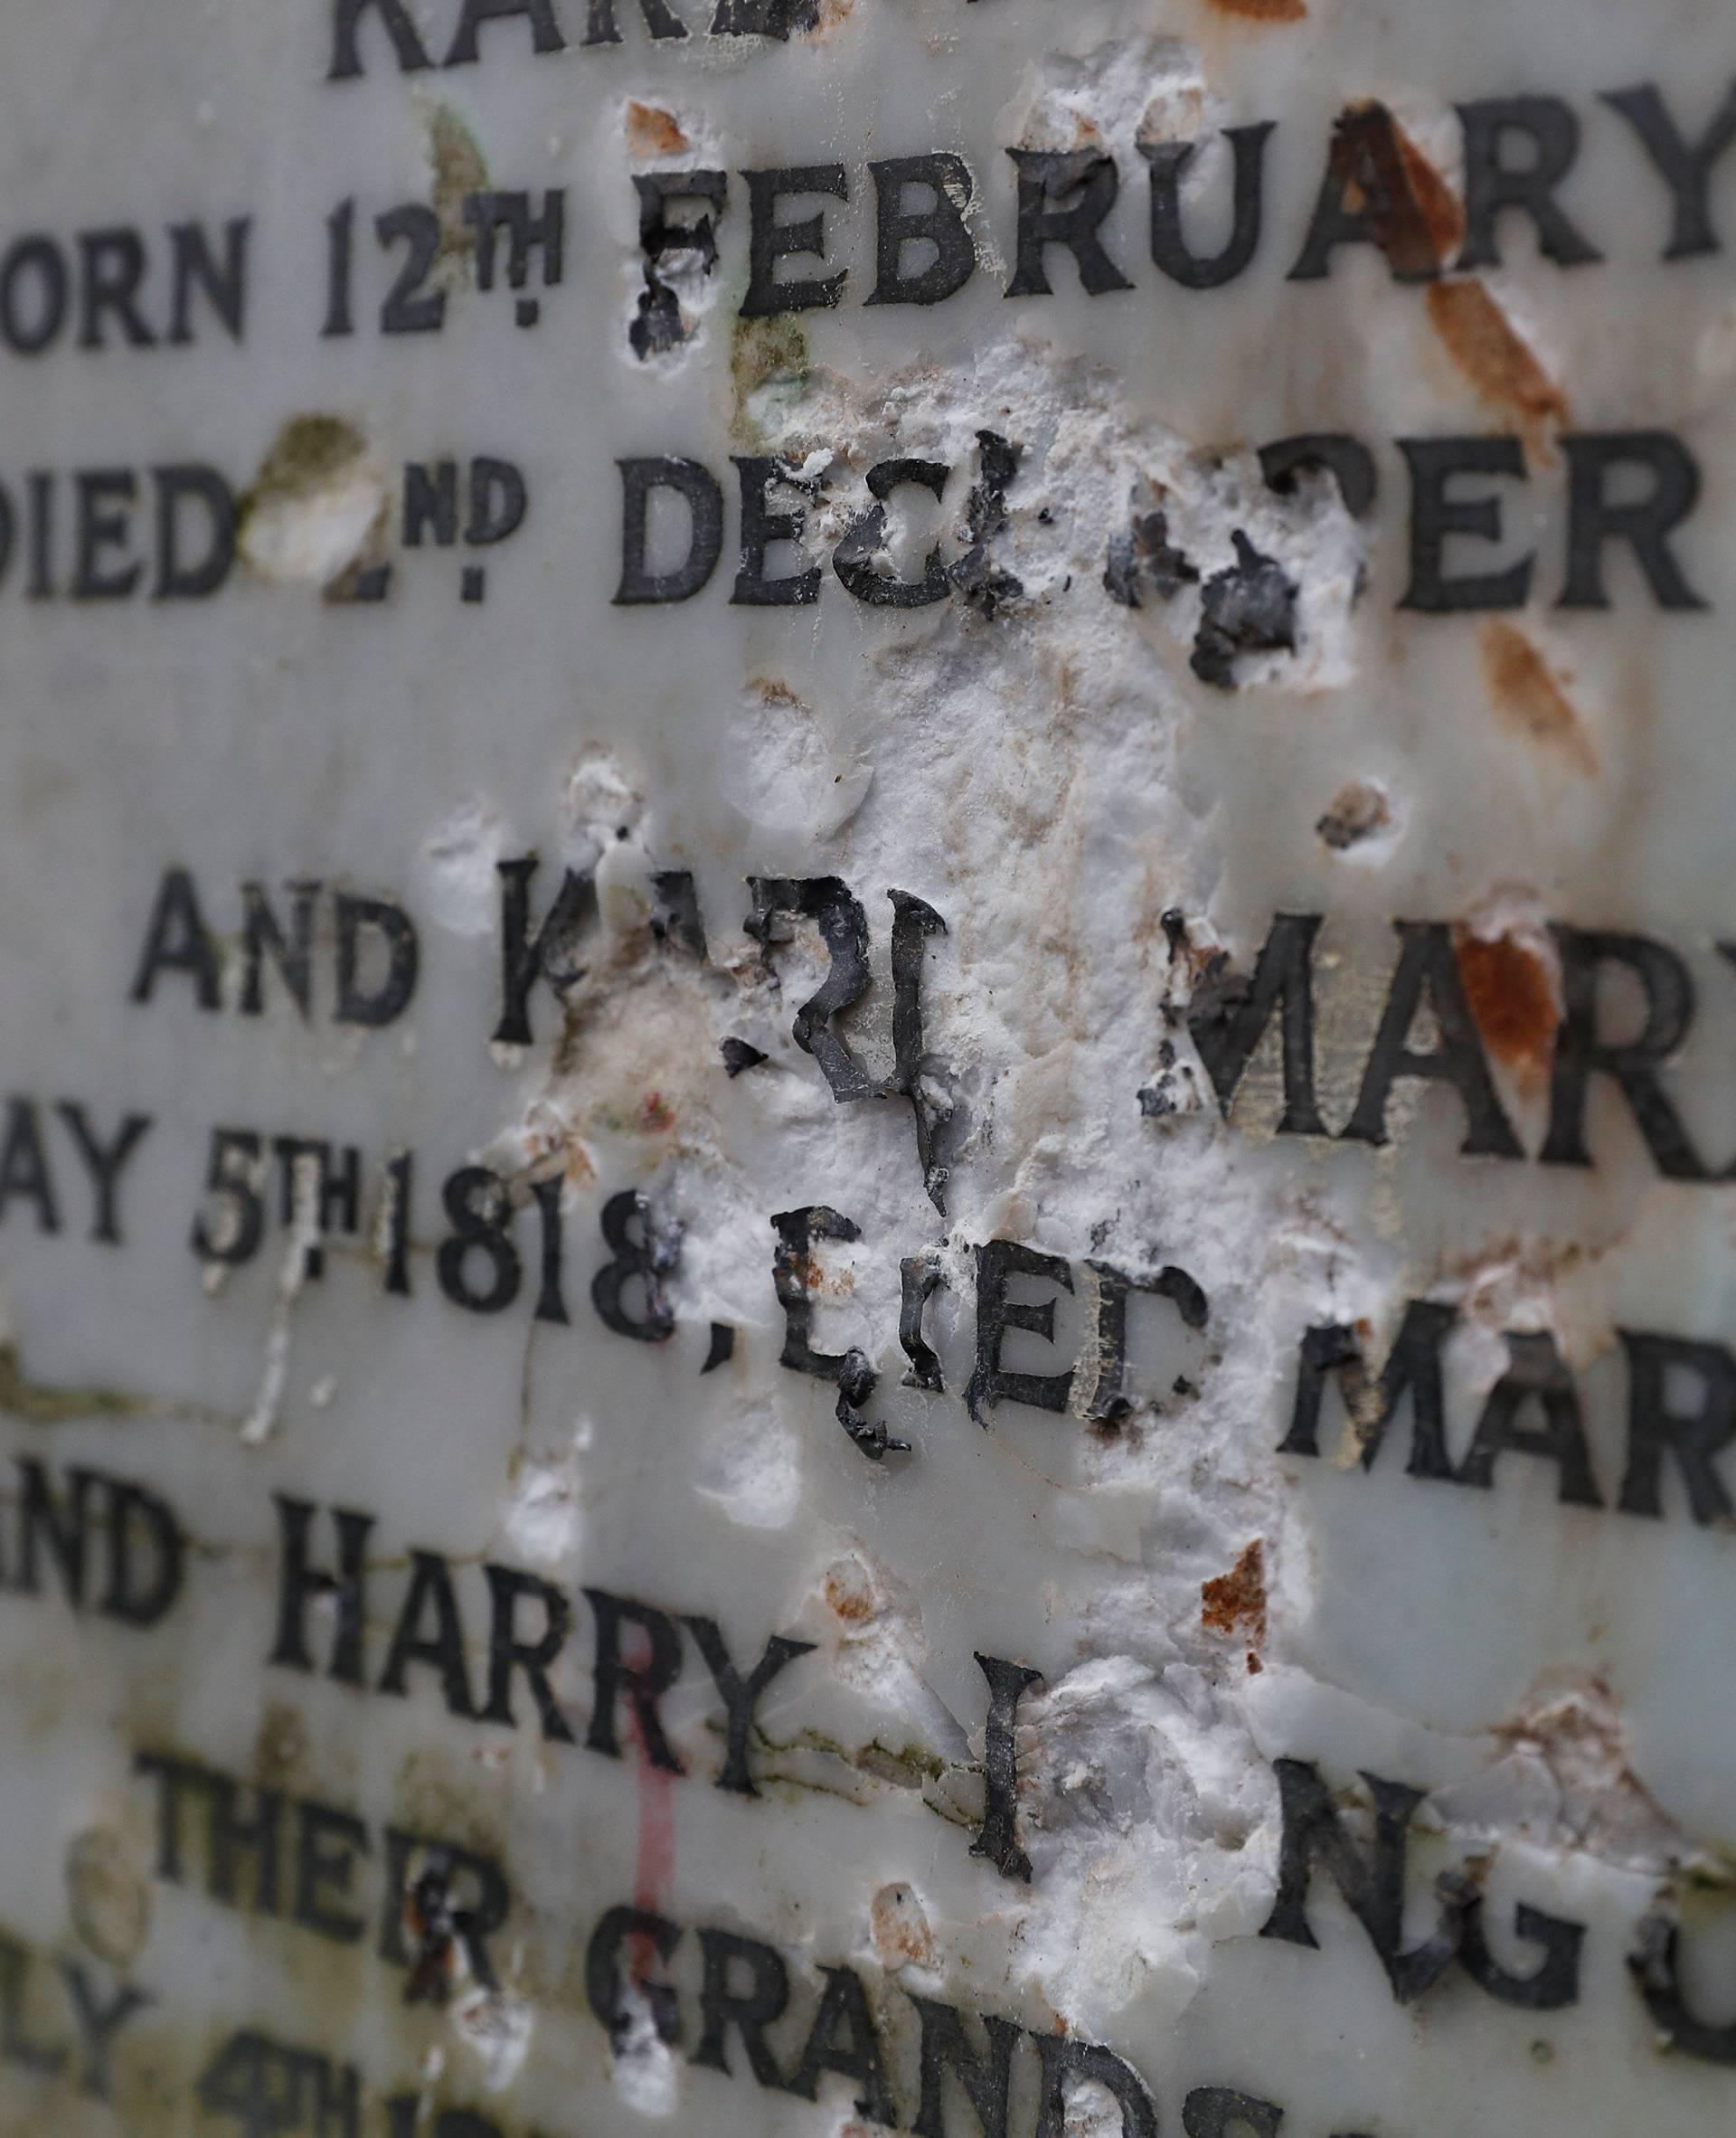 A memorial to German philosopher Karl Marx is seen after it was vandalised at Highgate Cemetery in north London